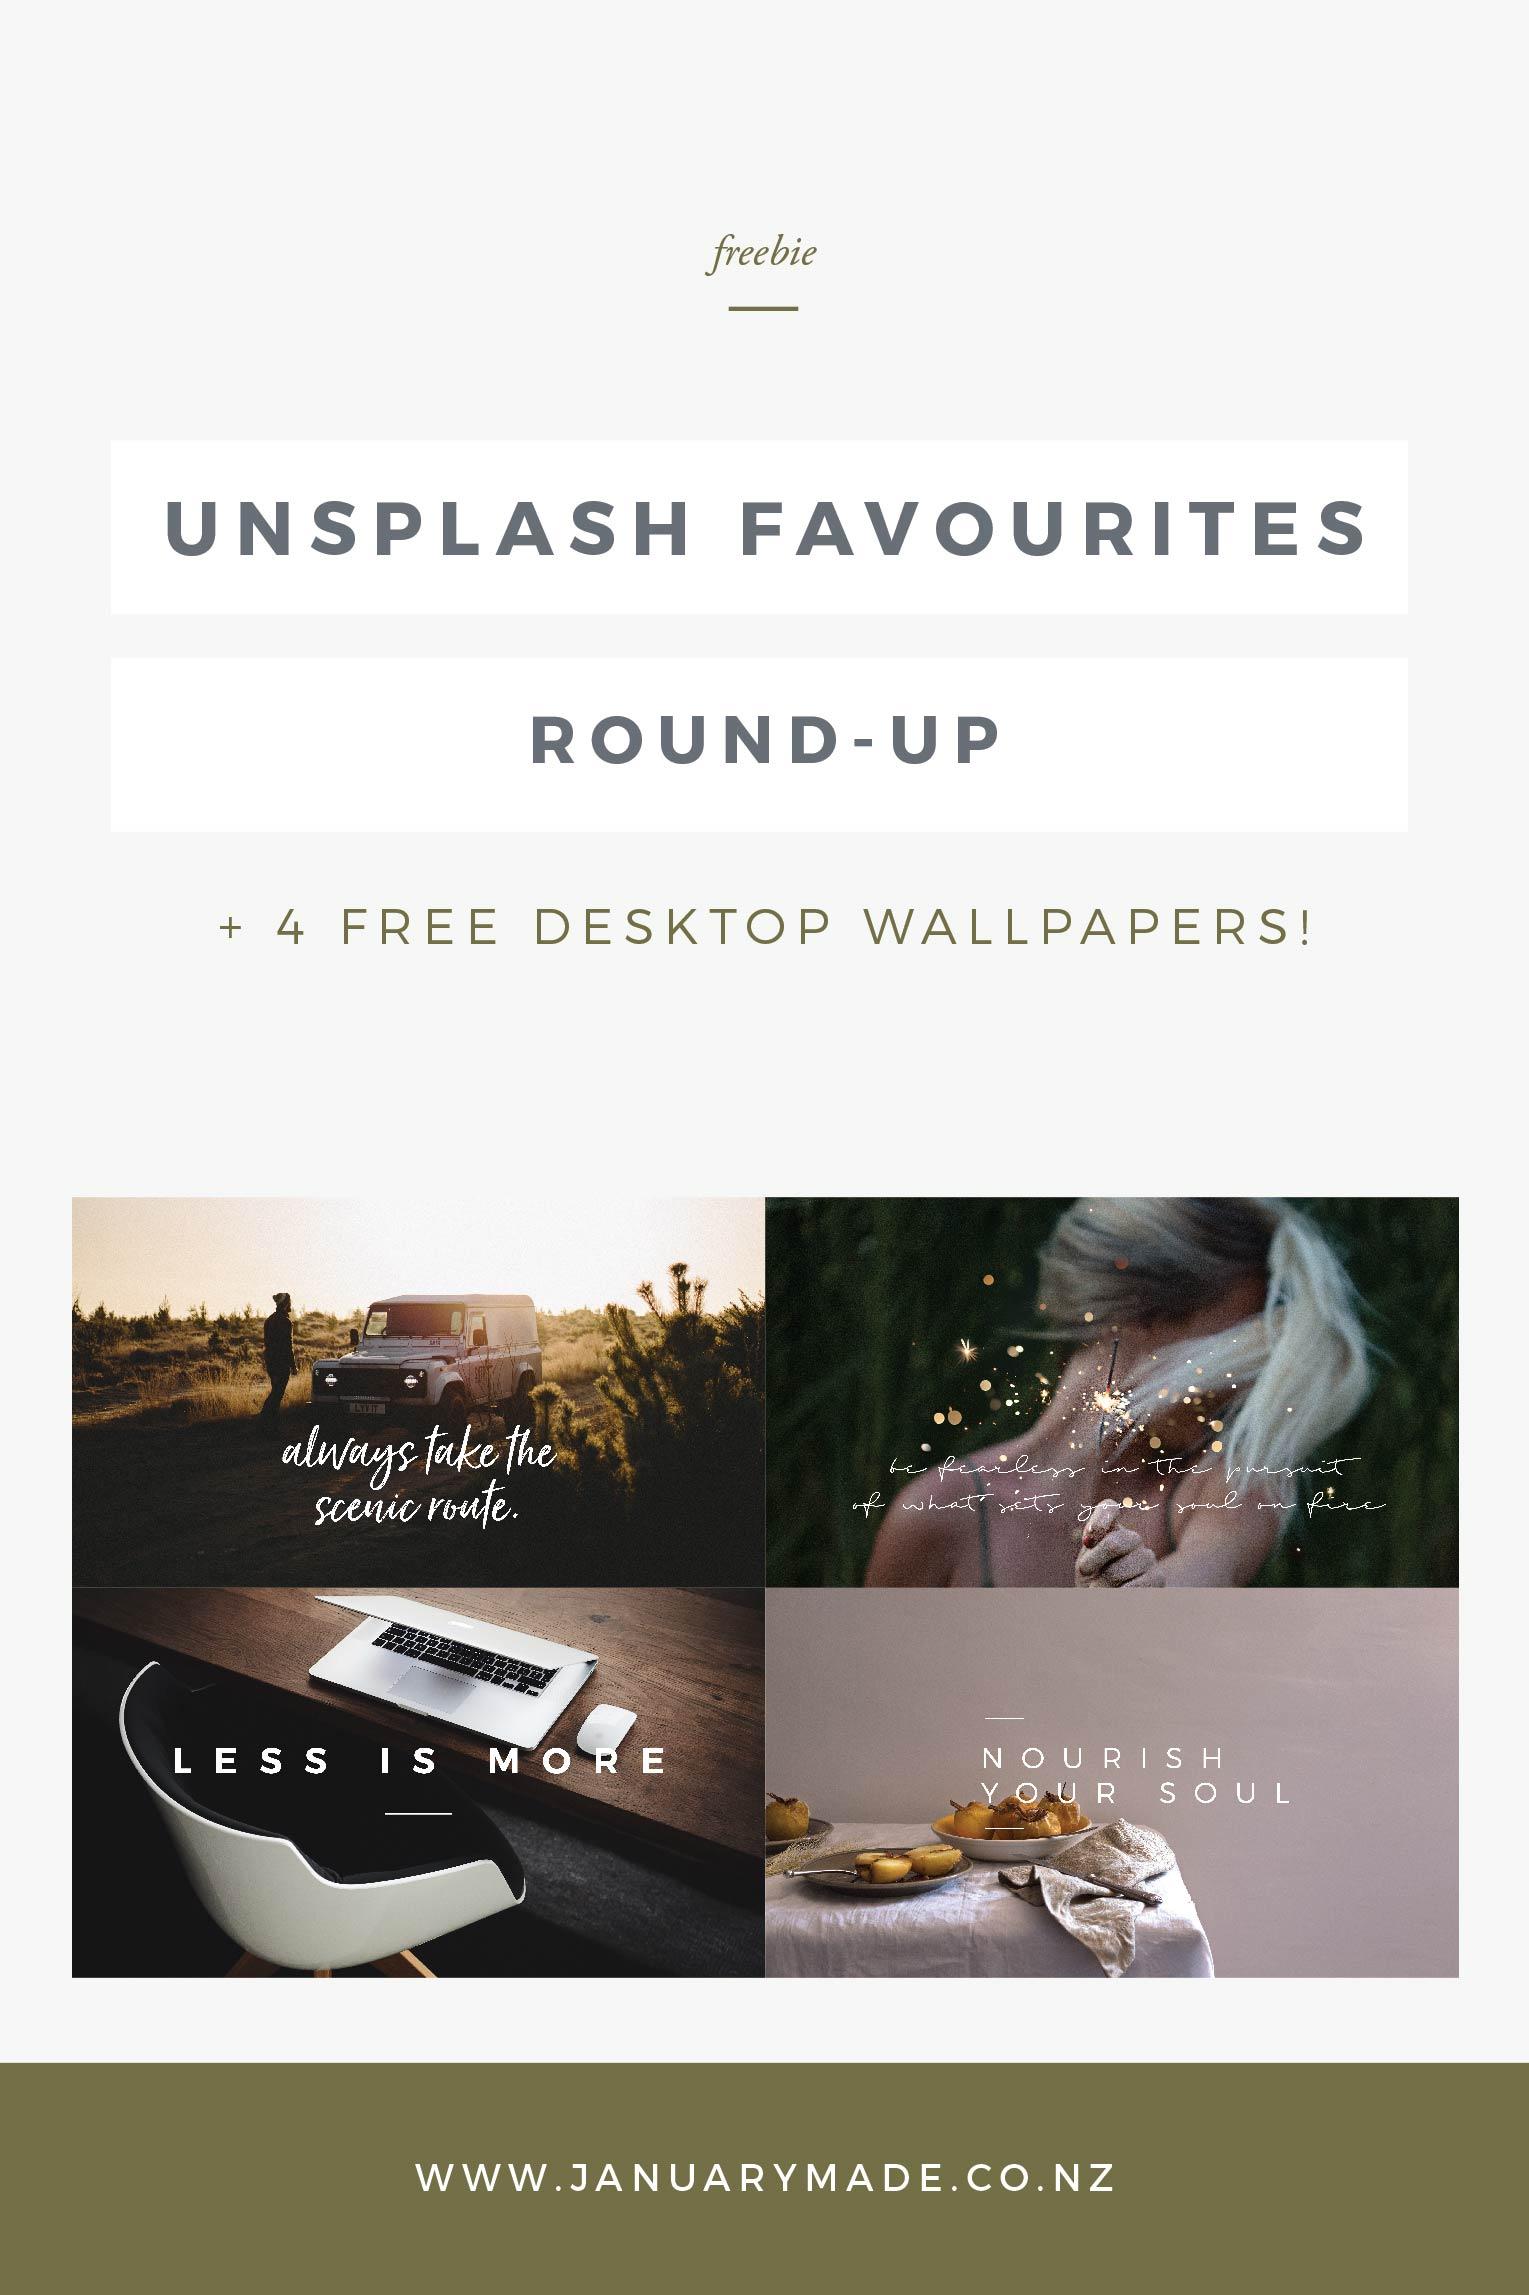 Unsplash Favourites Round-Up + FREE Desktop Wallpapers